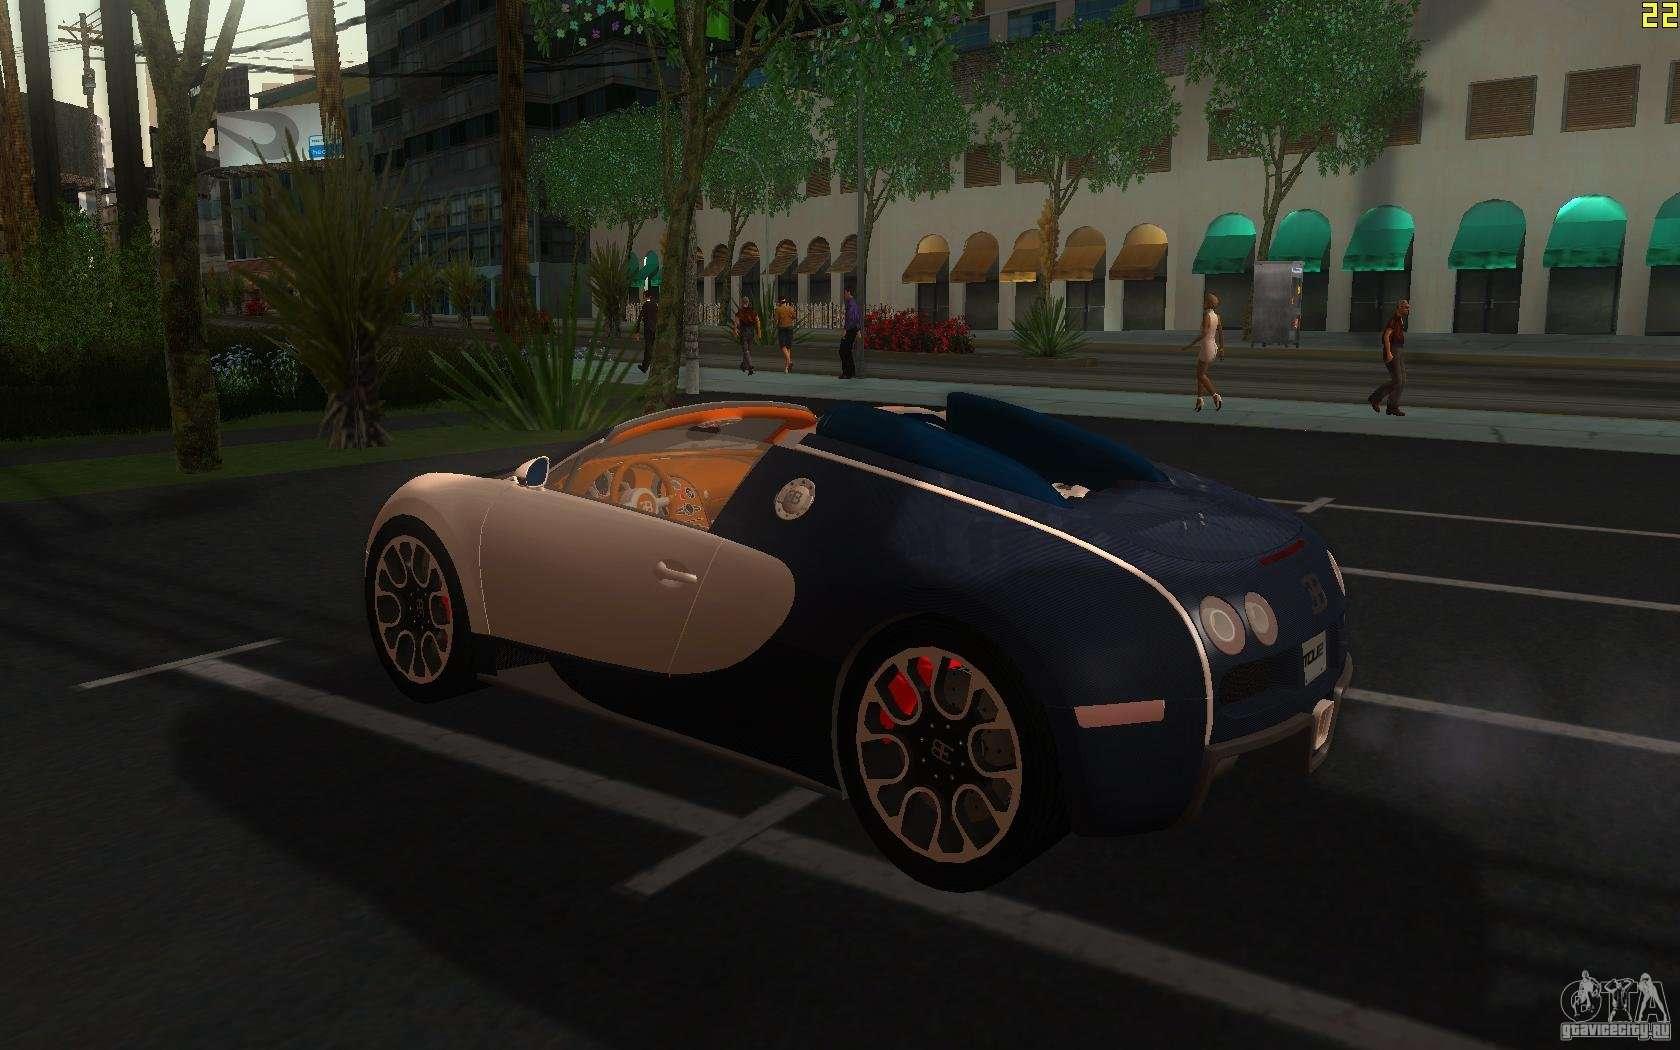 bugatti veyron 16 4 grand sport sang bleu para gta san andreas. Black Bedroom Furniture Sets. Home Design Ideas